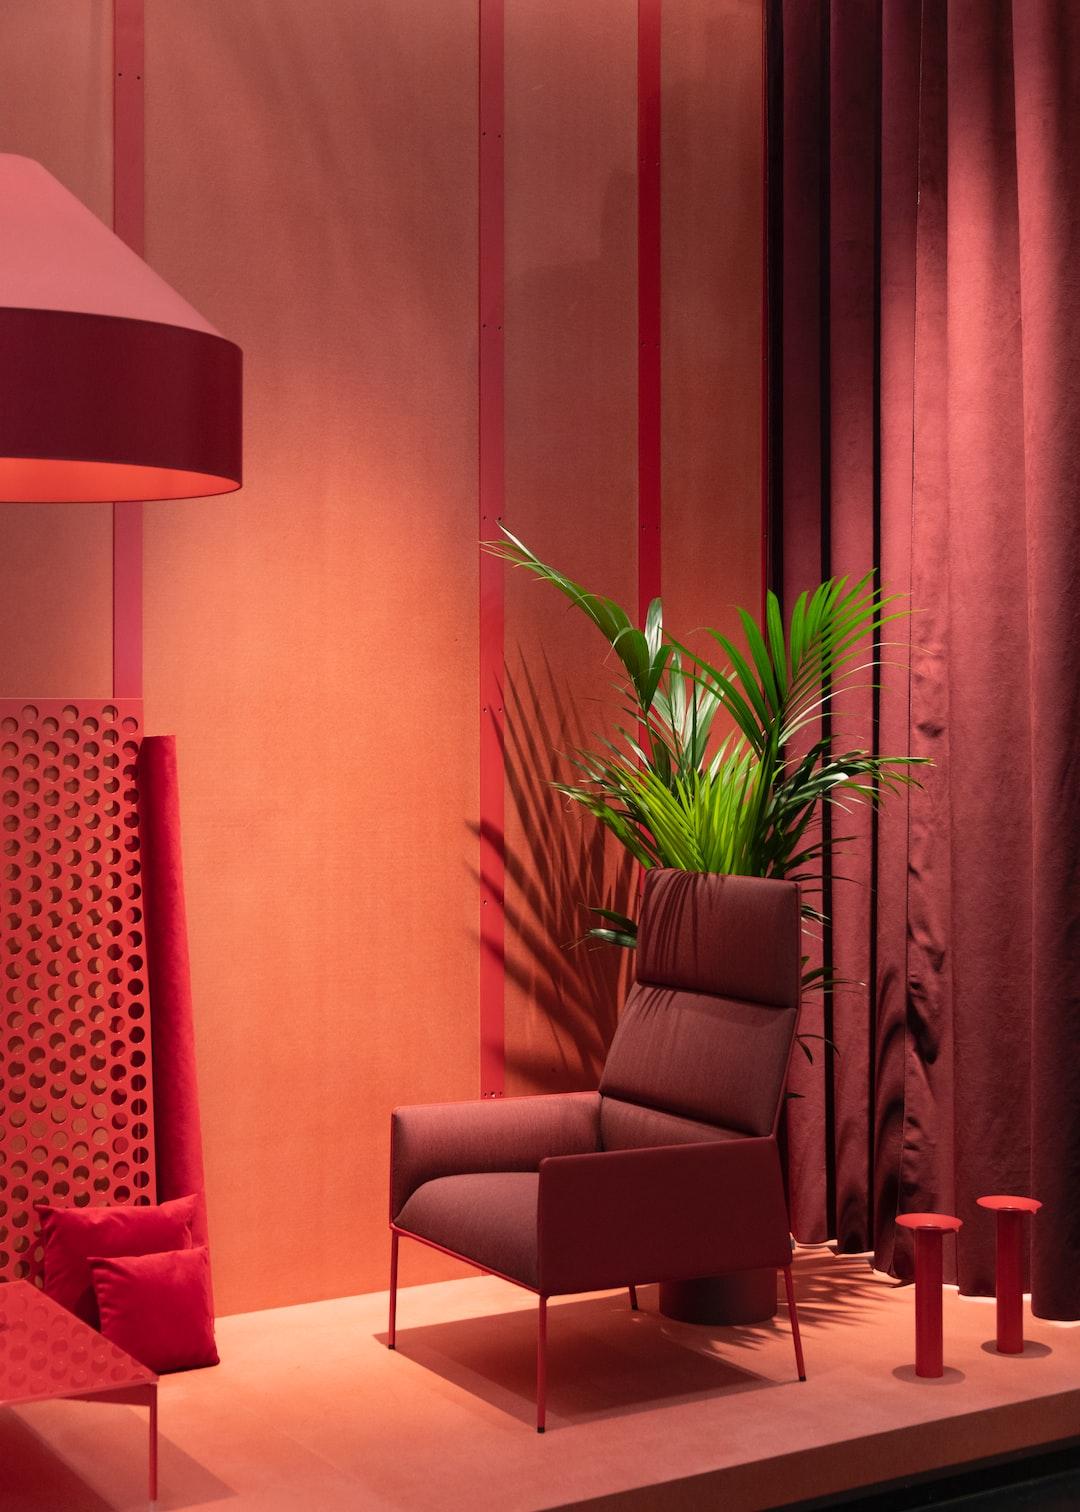 Empty Gray Sofa Chair Beside Palm Tree Photo Free